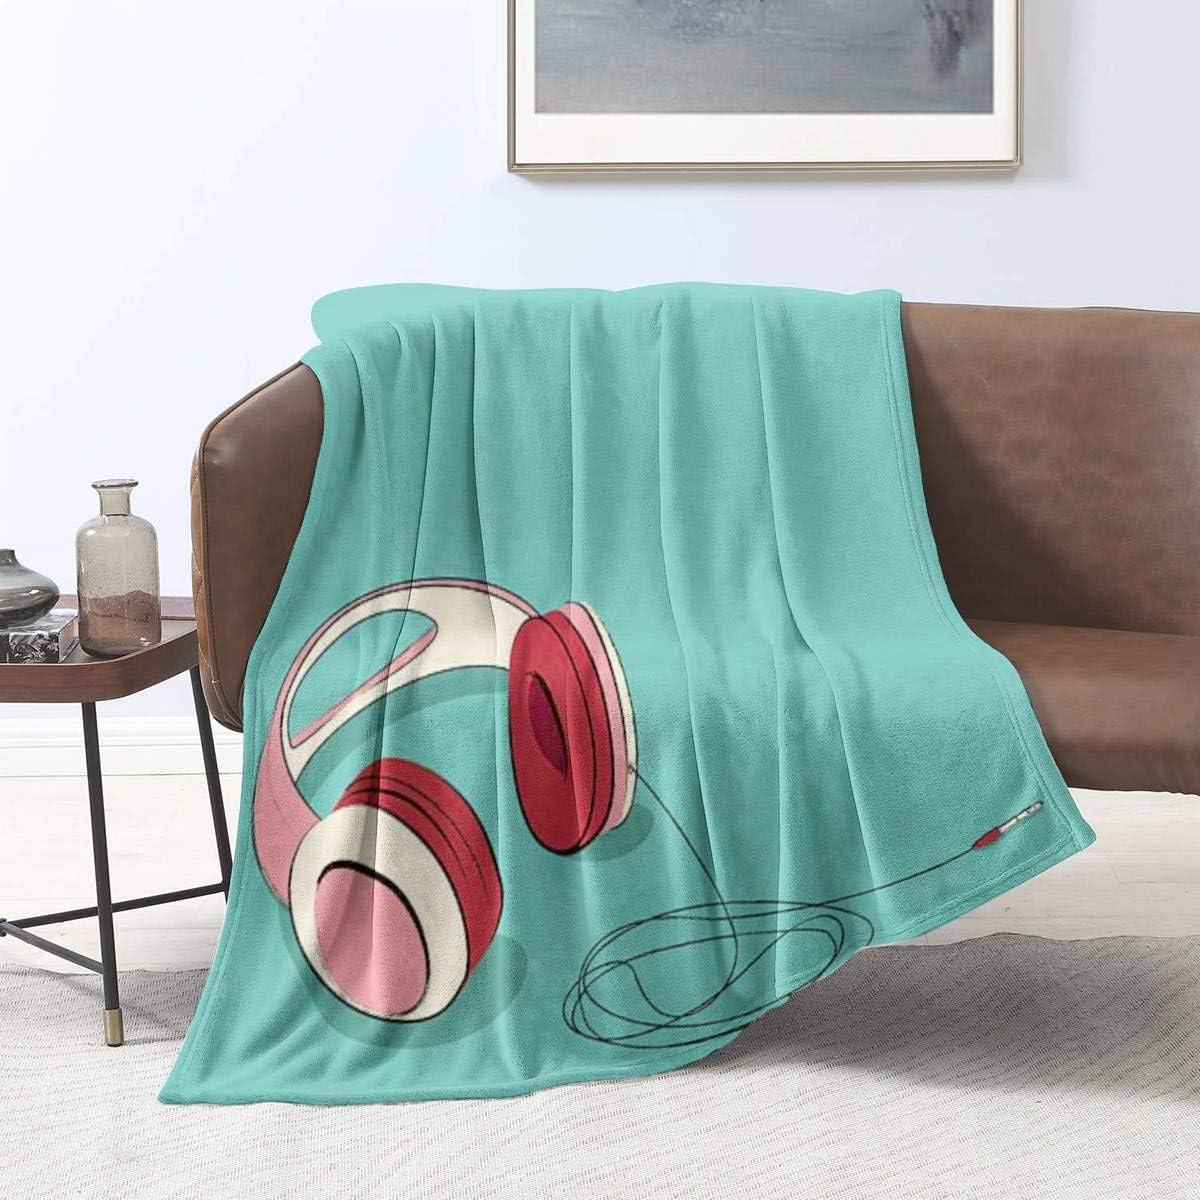 Ellekiwi Flannel Blanket Girlish All stores are sold Headphones Limited price Illustration P Stock